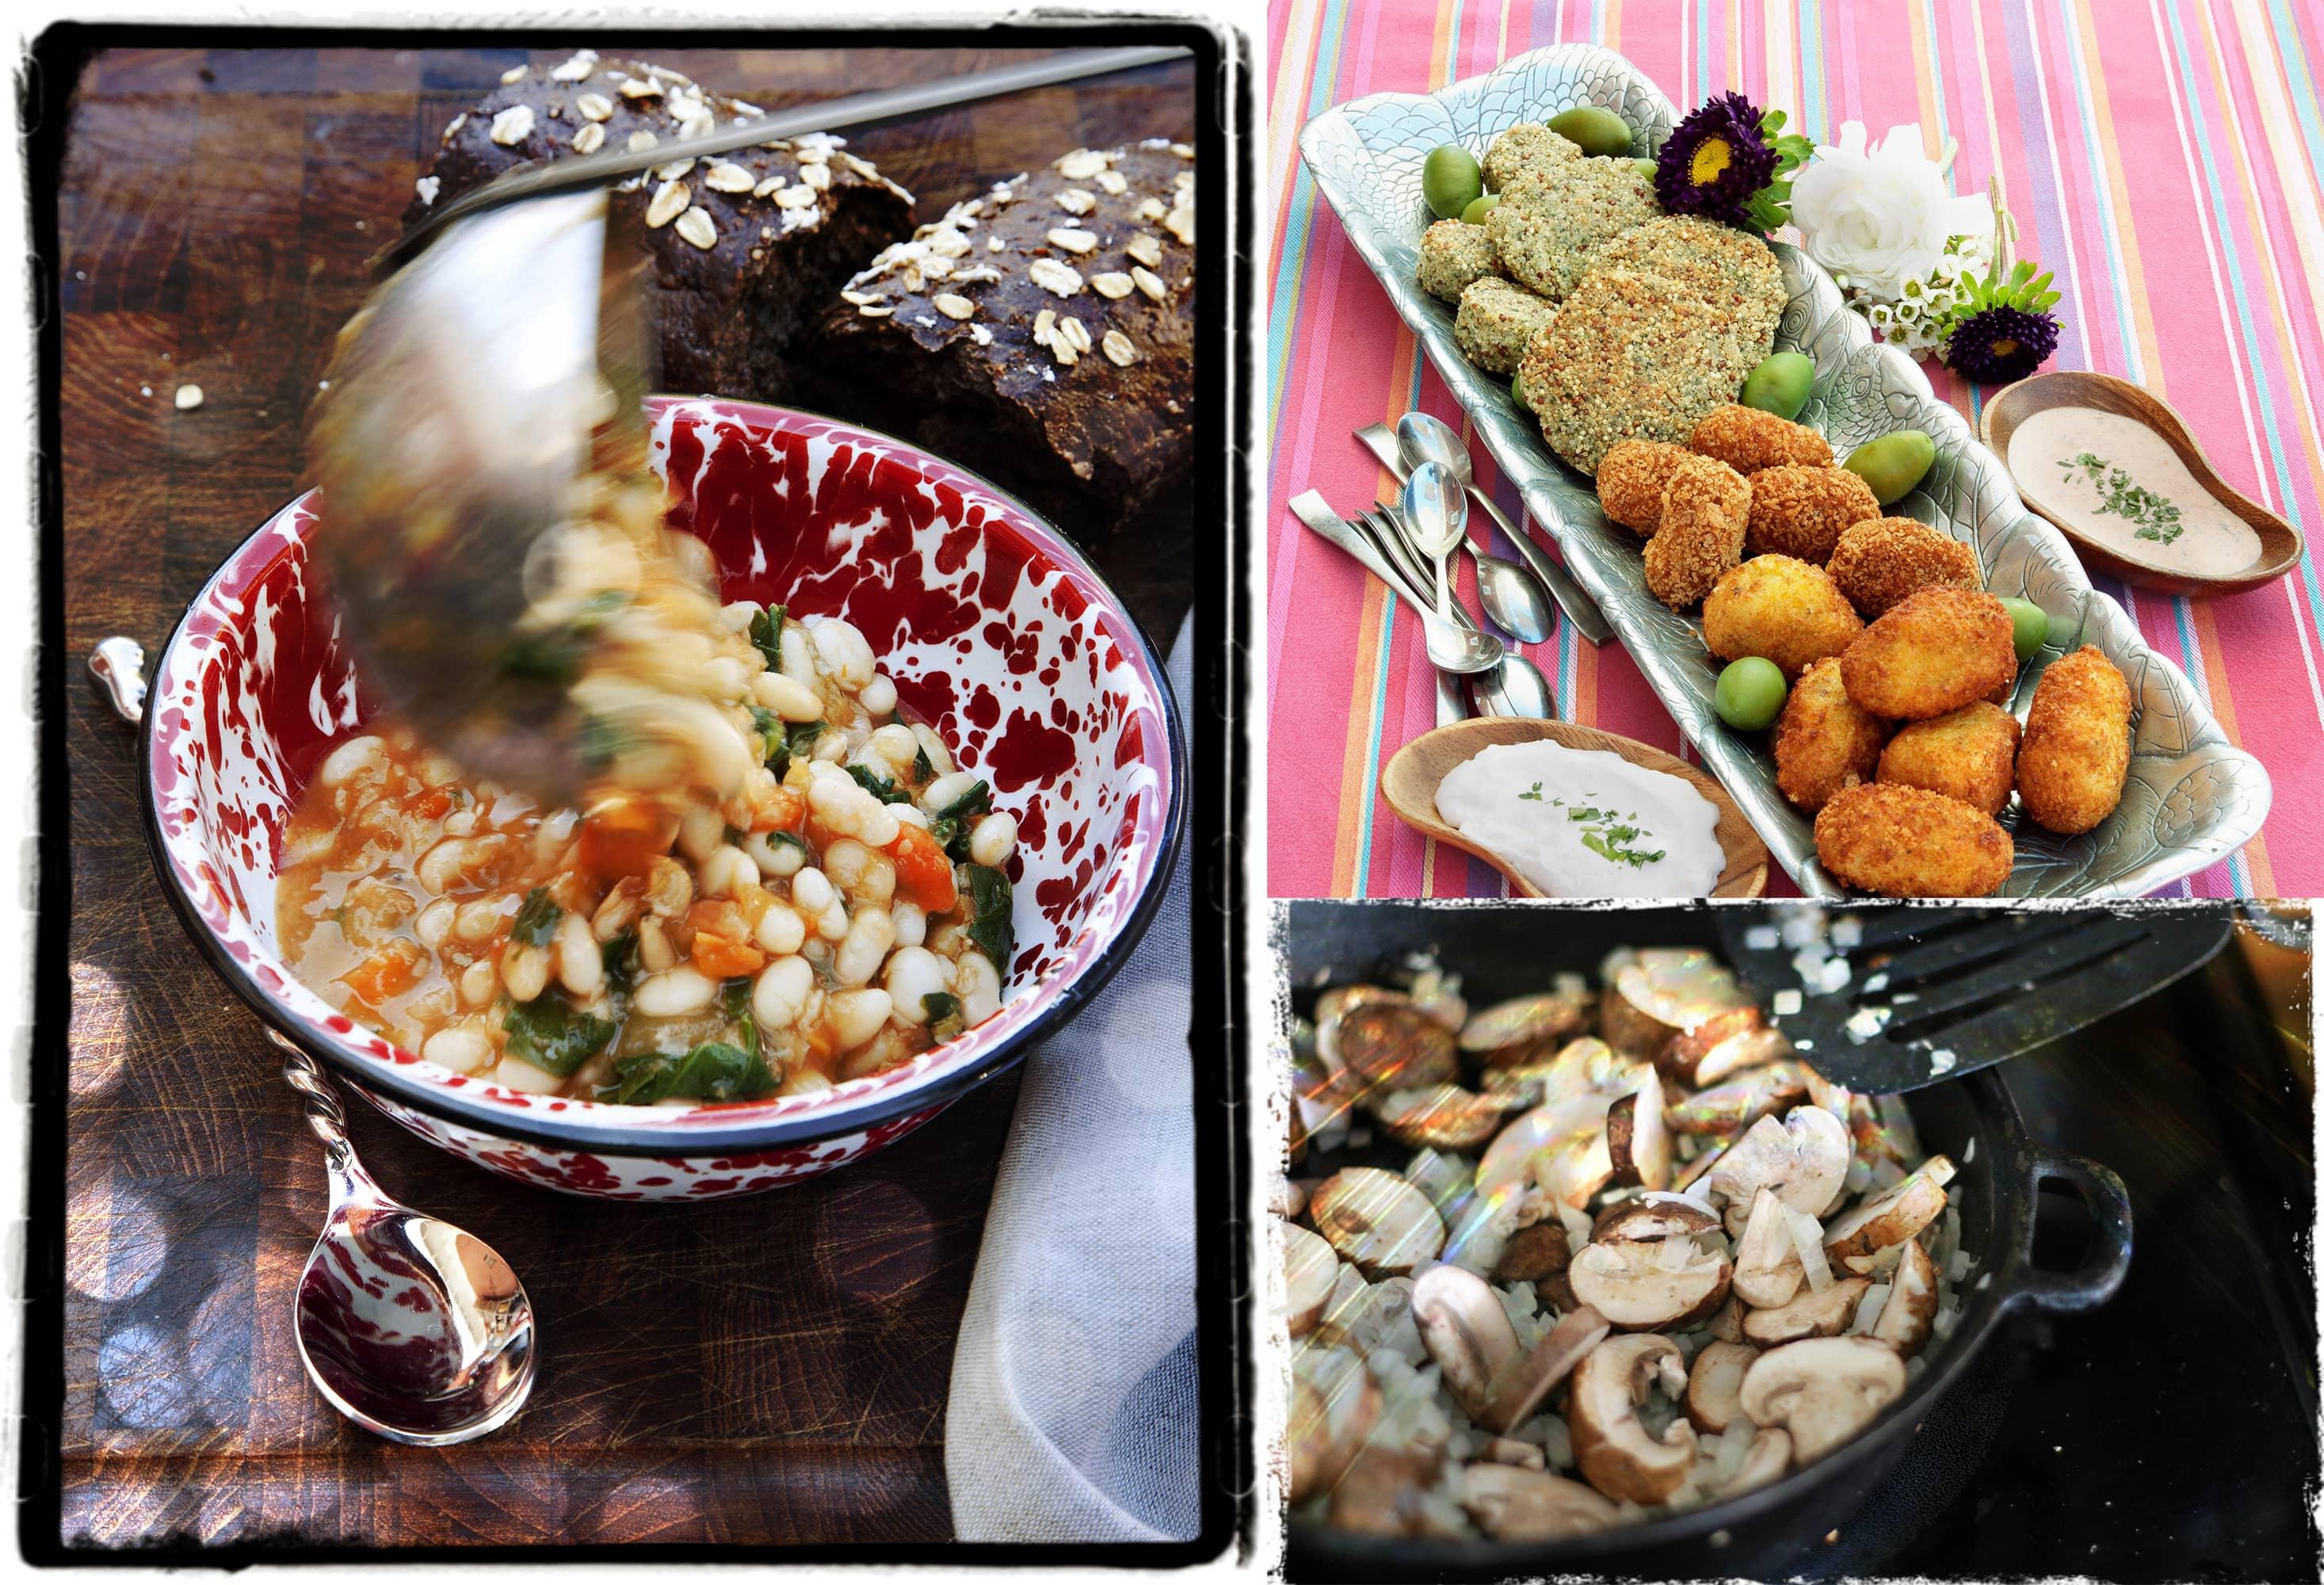 Jennie Cook's Versatile Vegan Dinner Menu